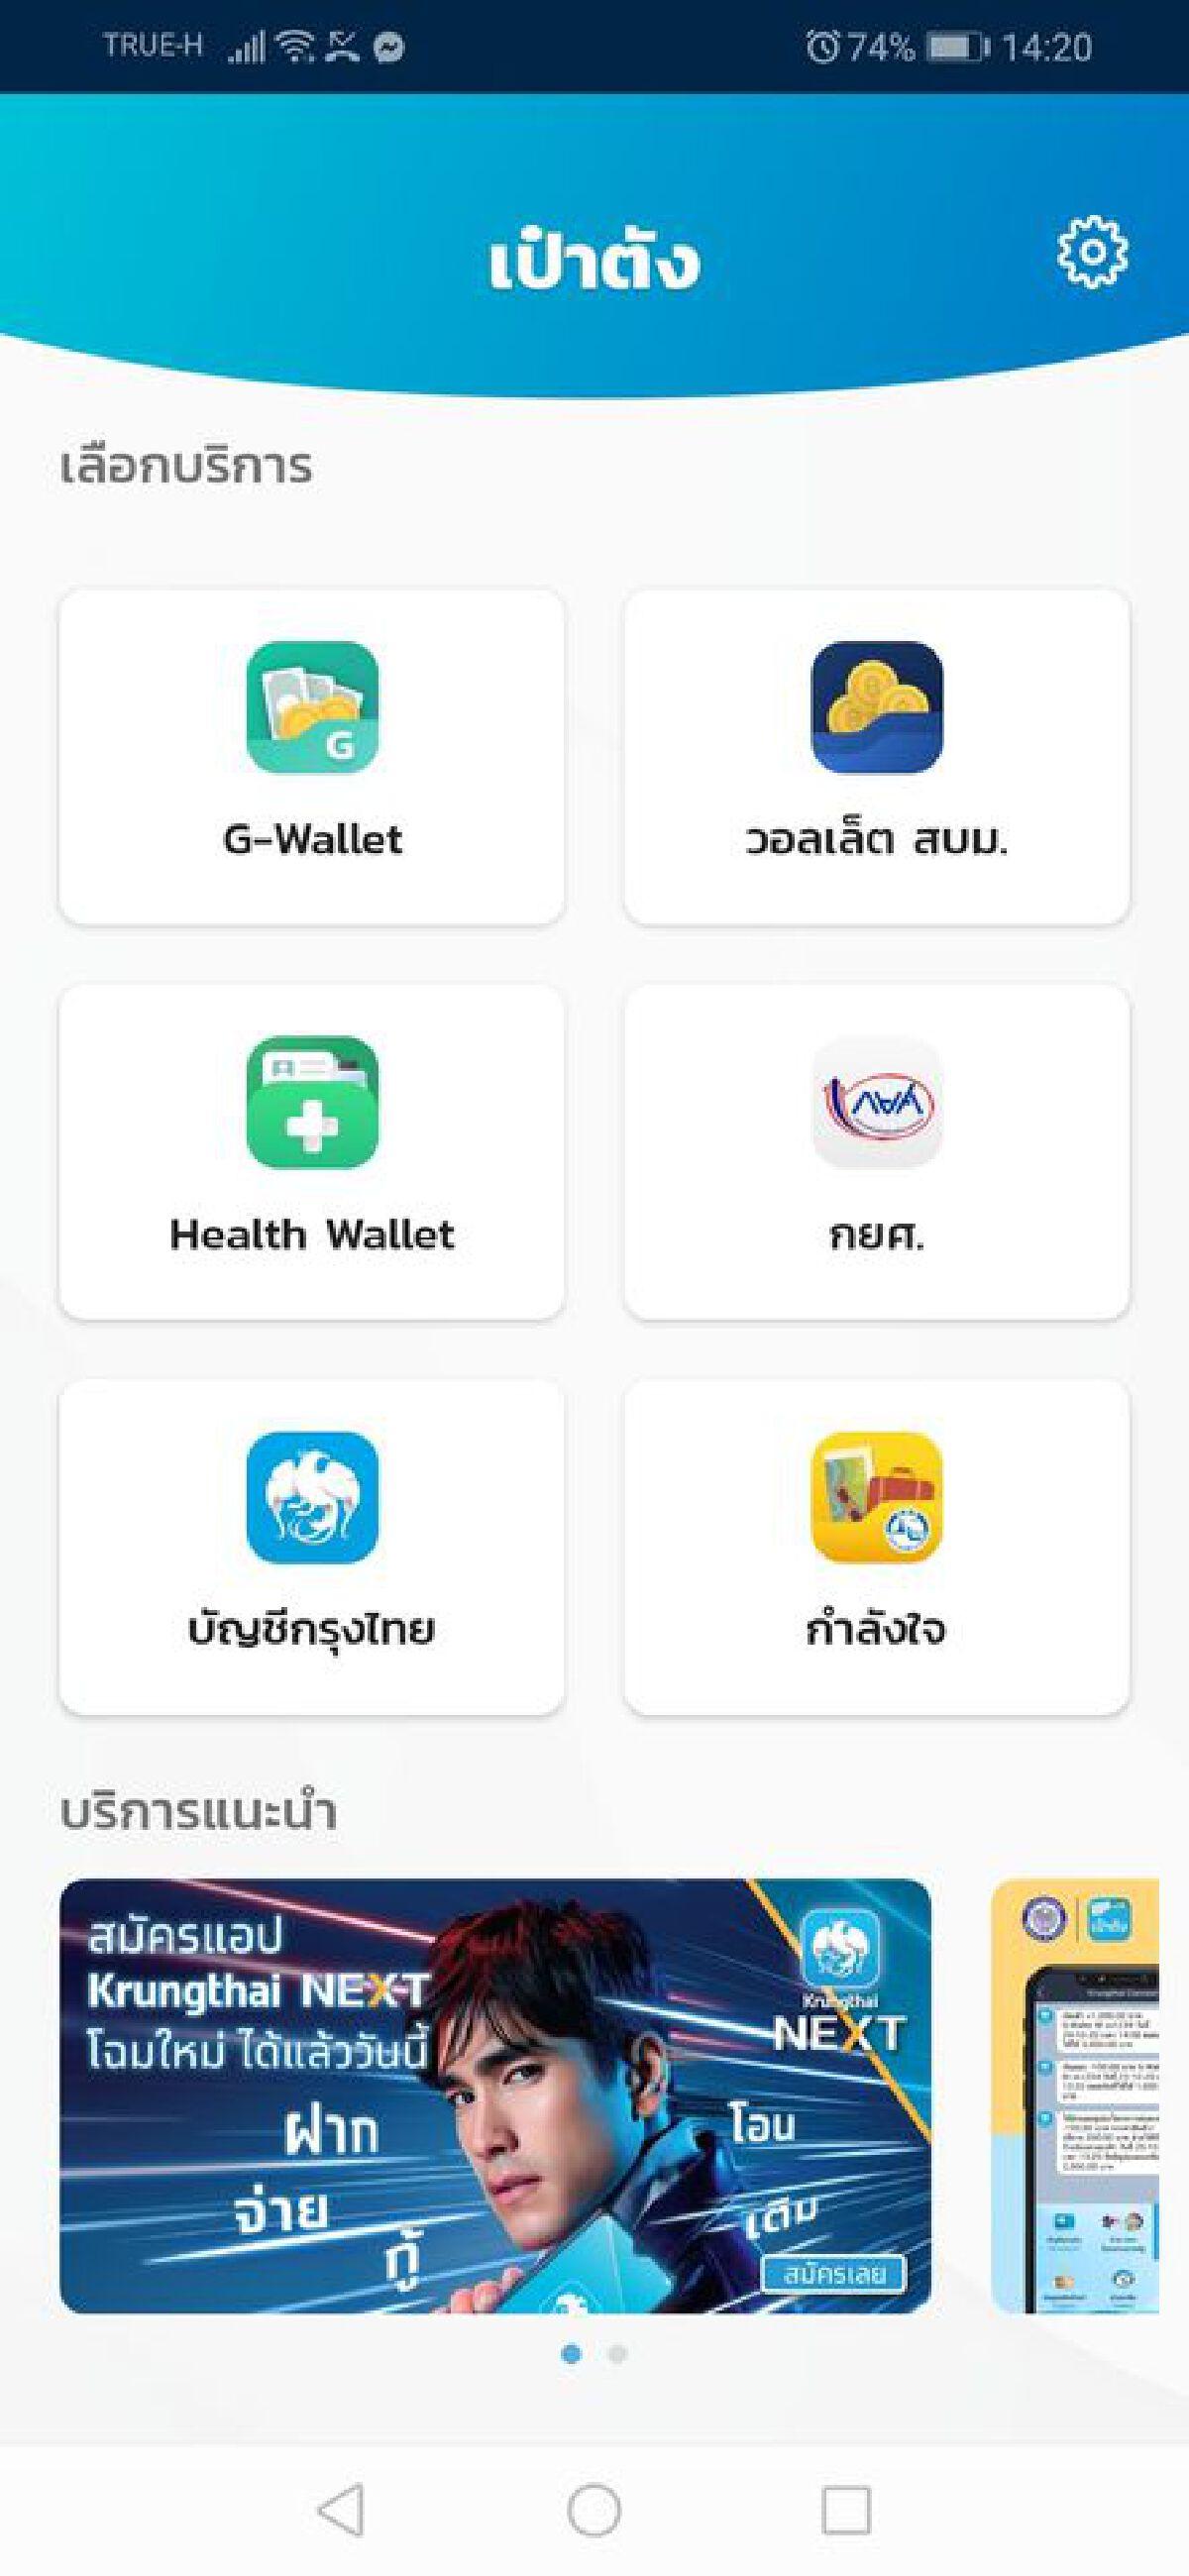 """Health Wallet"" บนแอปฯ เป๋าตัง ฟีเจอร์ที่ให้บริการด้านสุขภาพ"